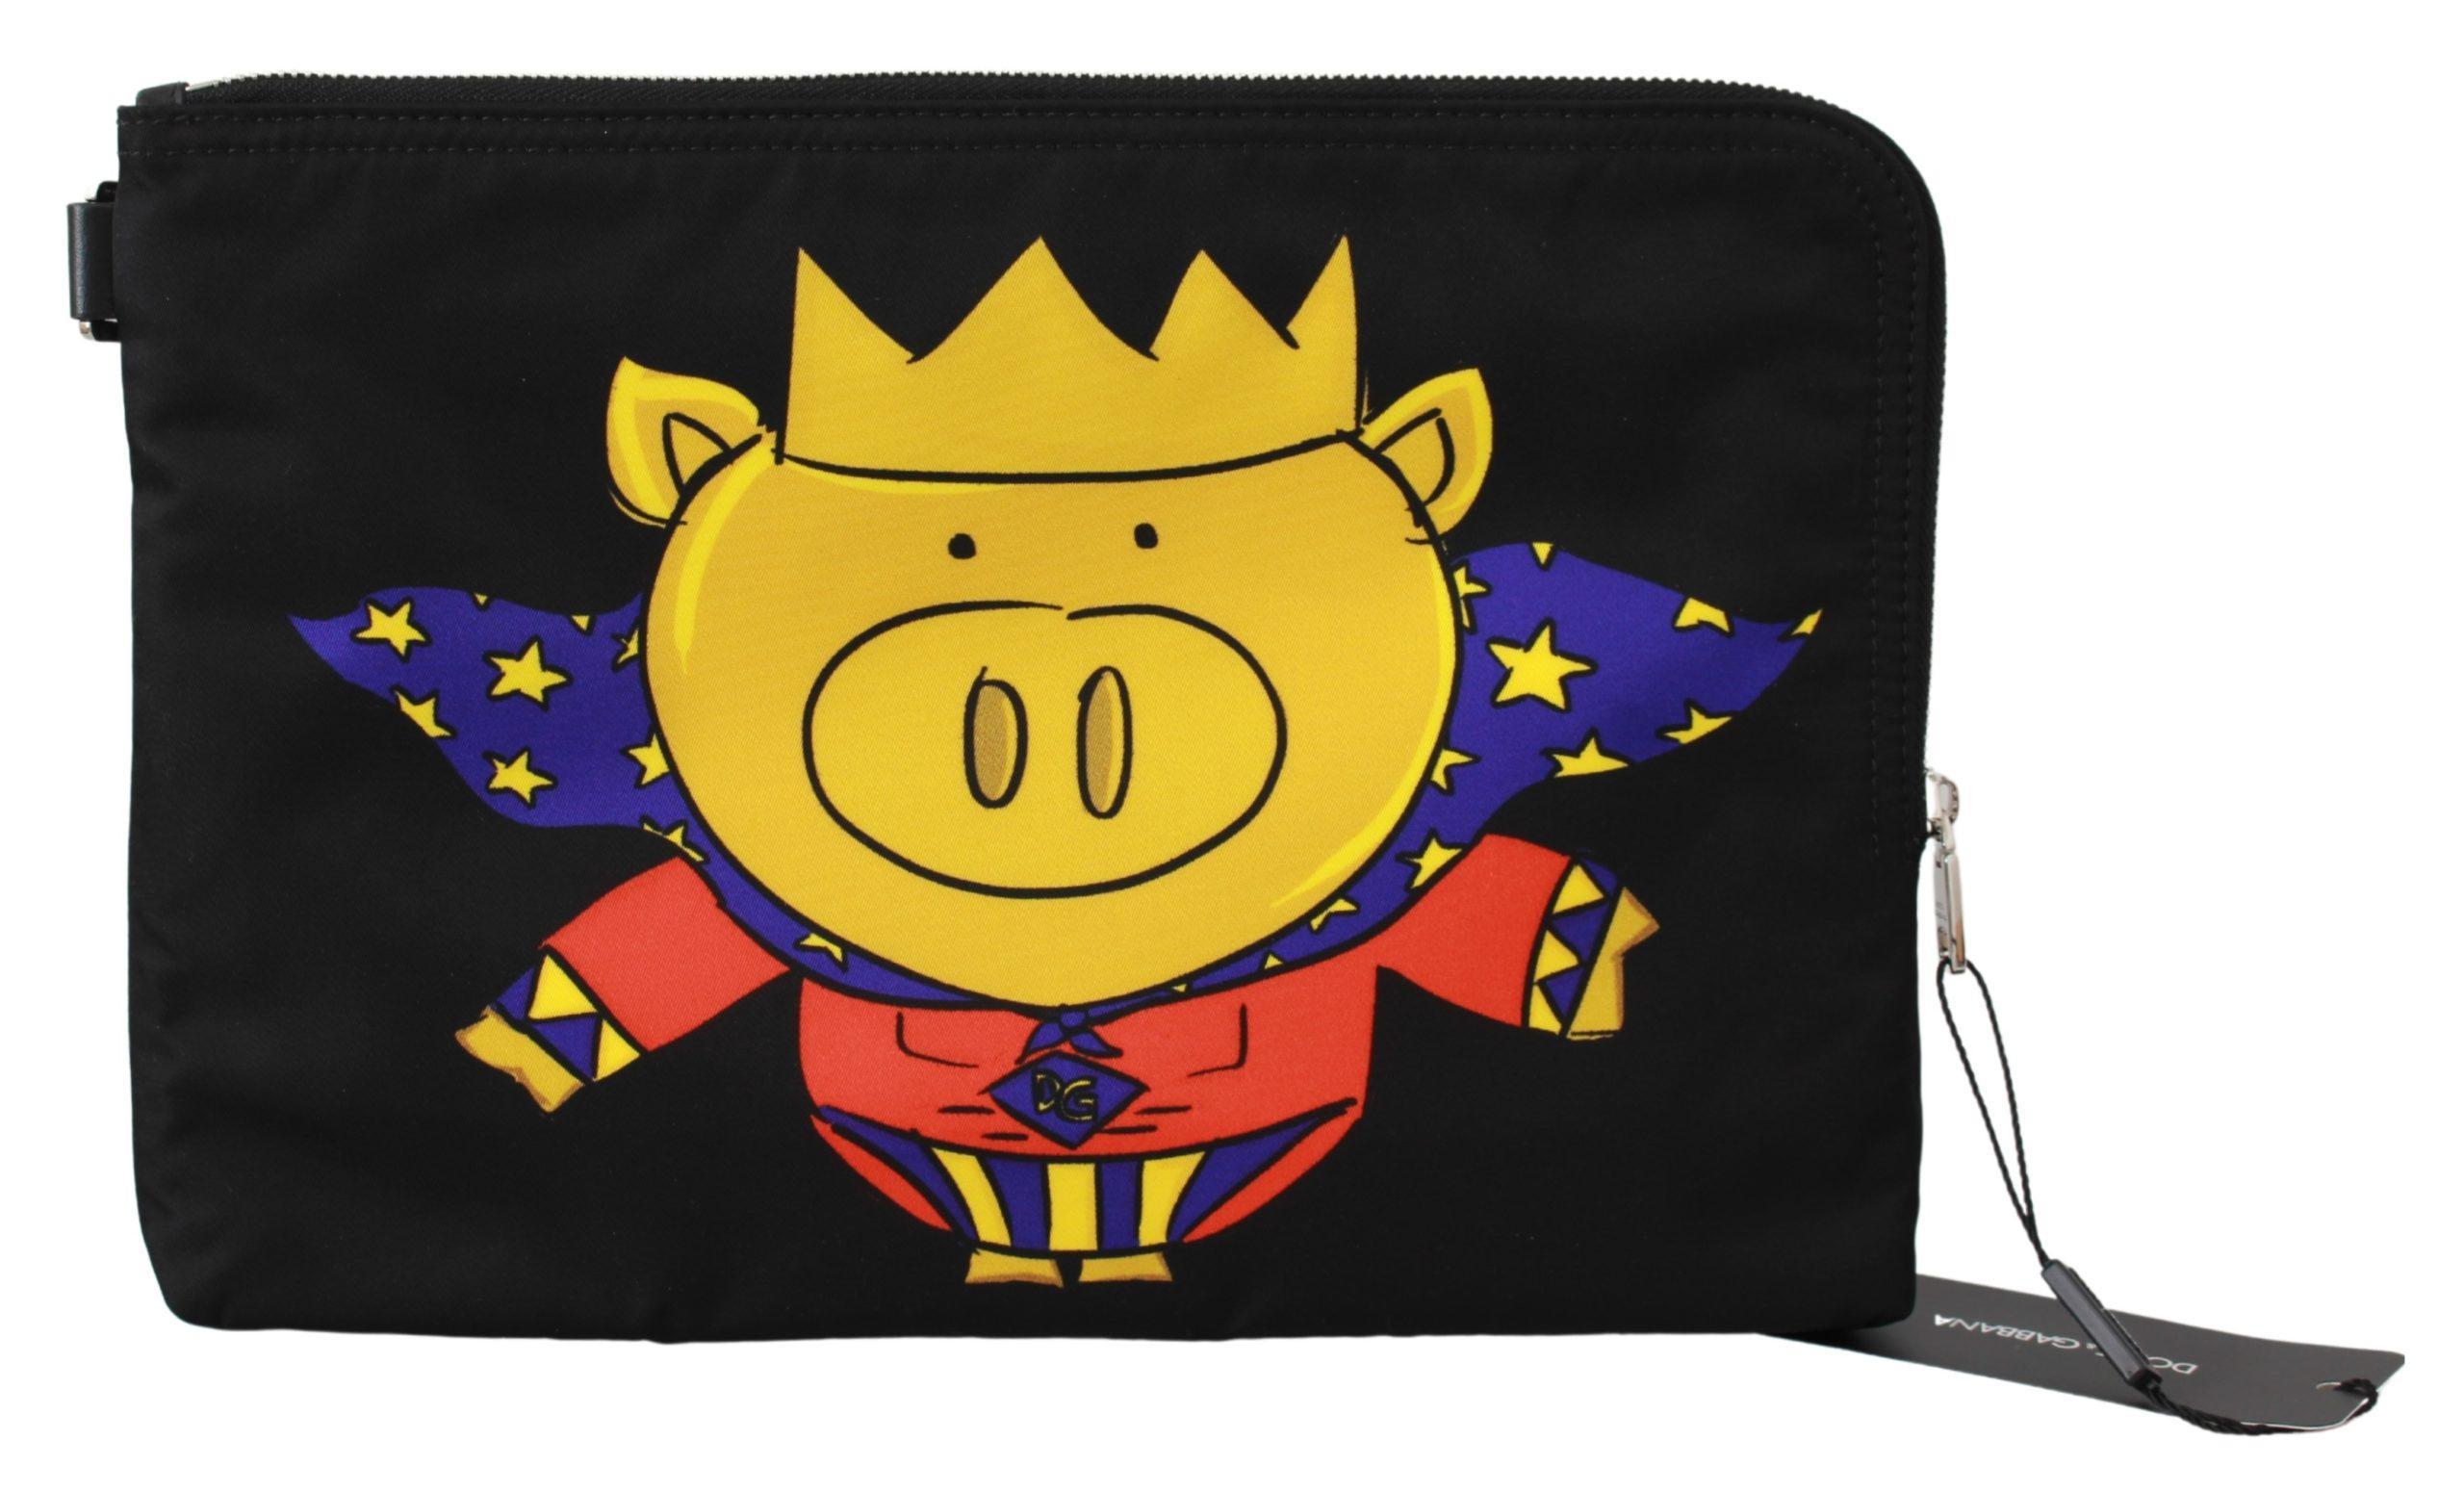 Dolce & Gabbana Men's Super Pig Print Hand Messenger Bag Black VAS9494